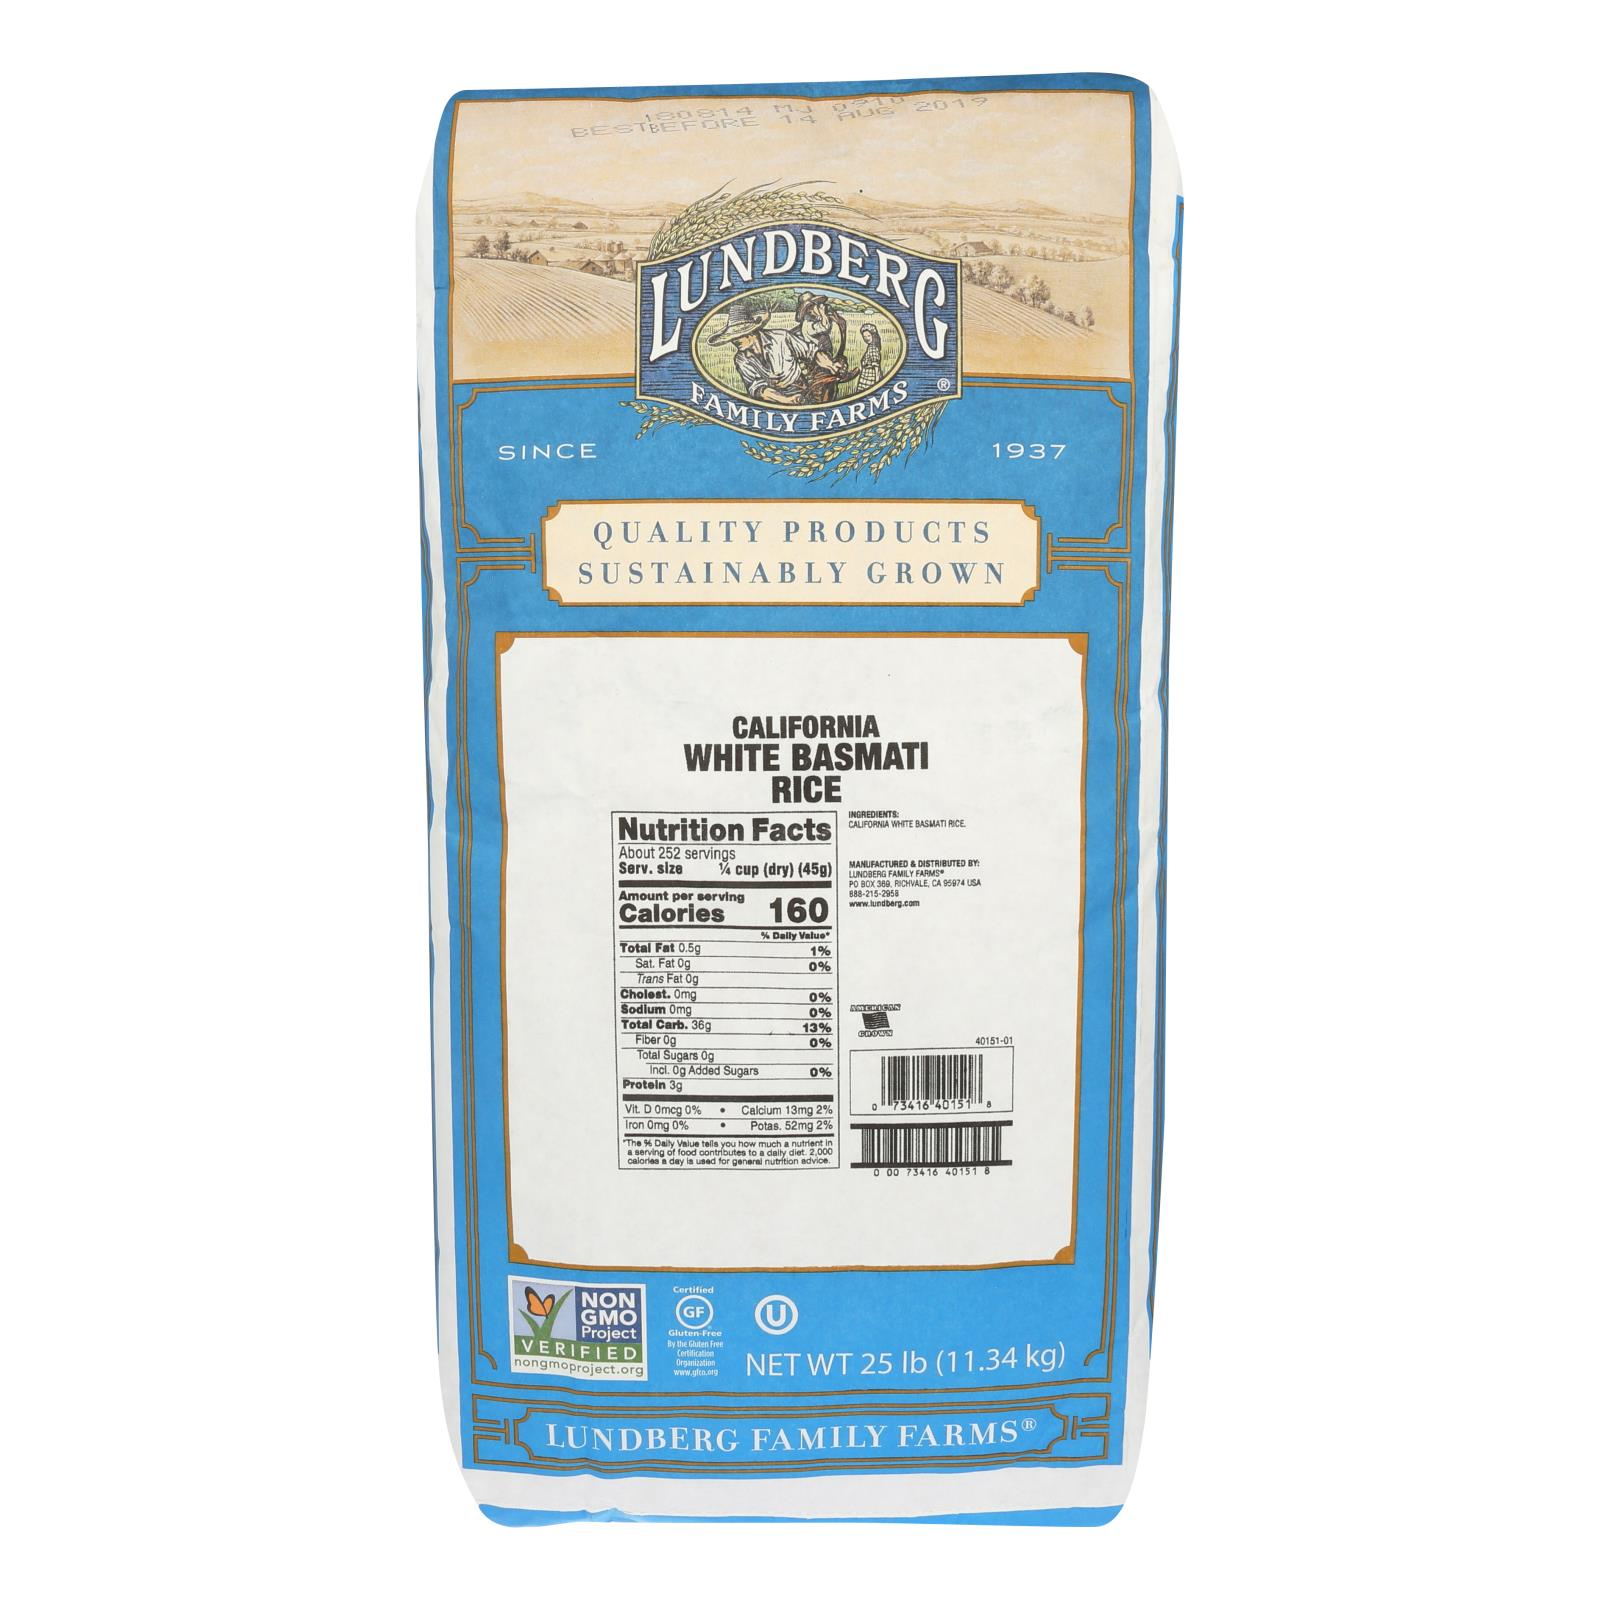 Lundberg Family Farms California White Basmati Rice - Case of 25 lbs %count(alt)